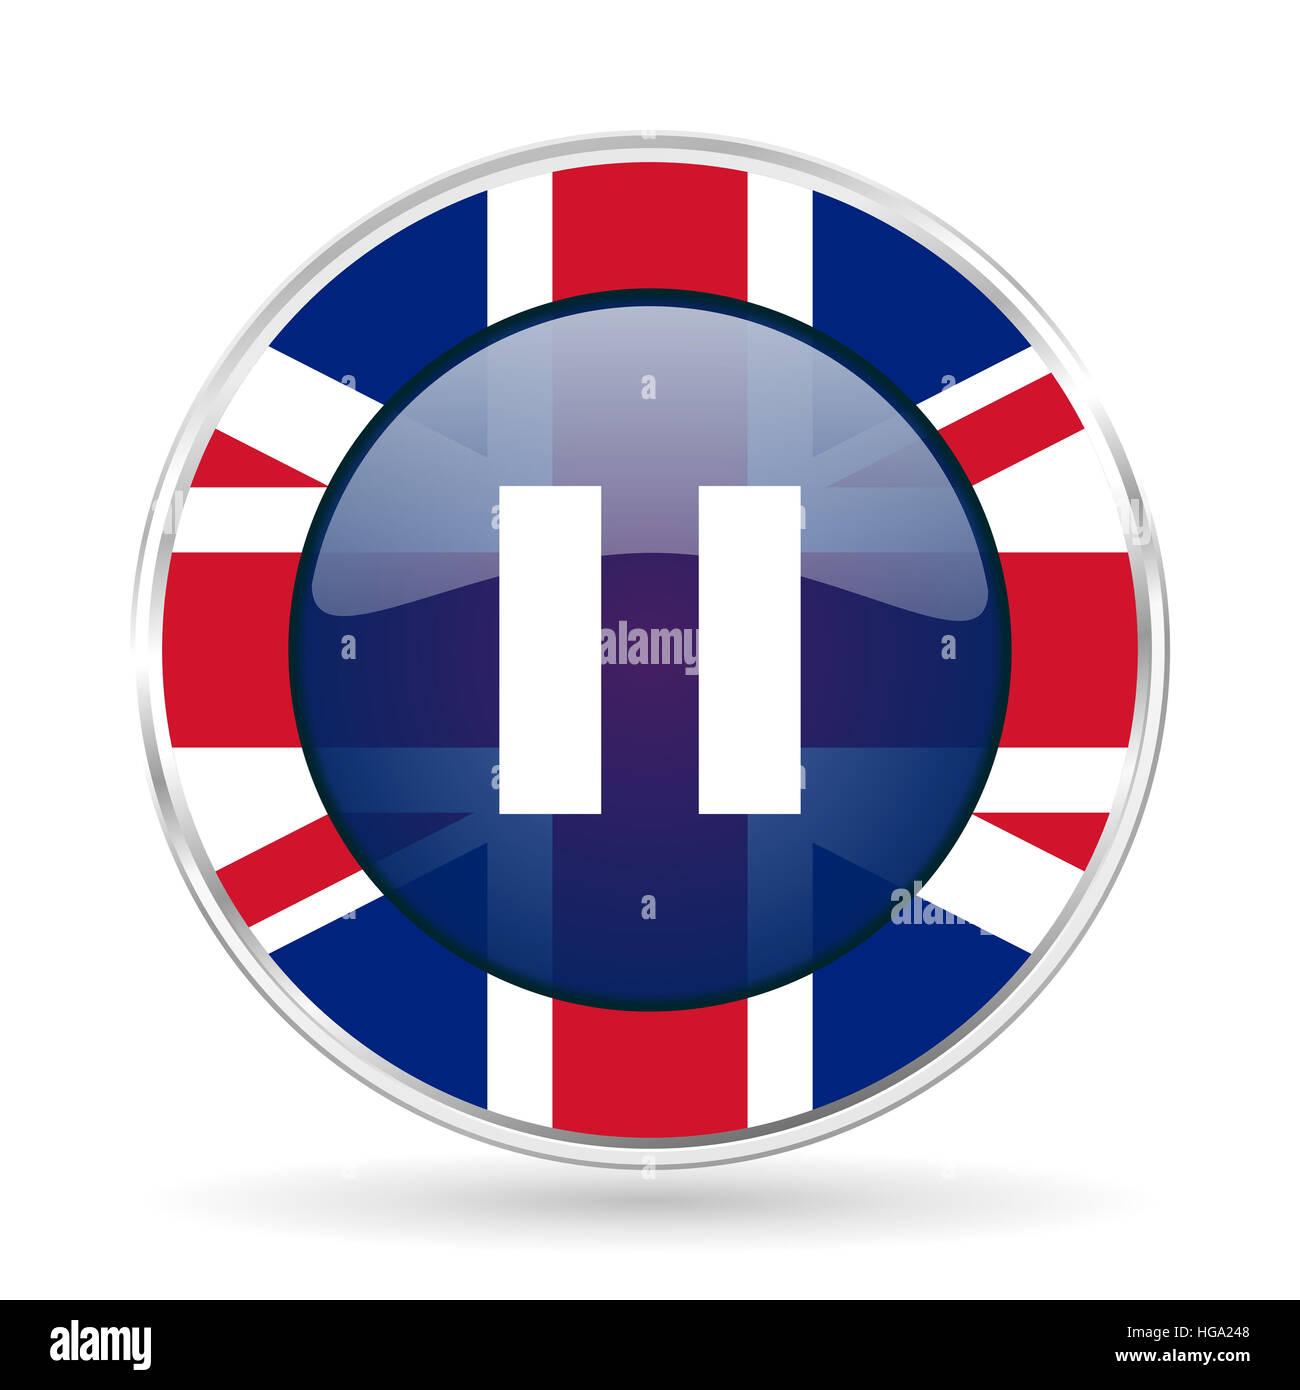 pause british design icon - round silver metallic border button with Great Britain flag - Stock Image